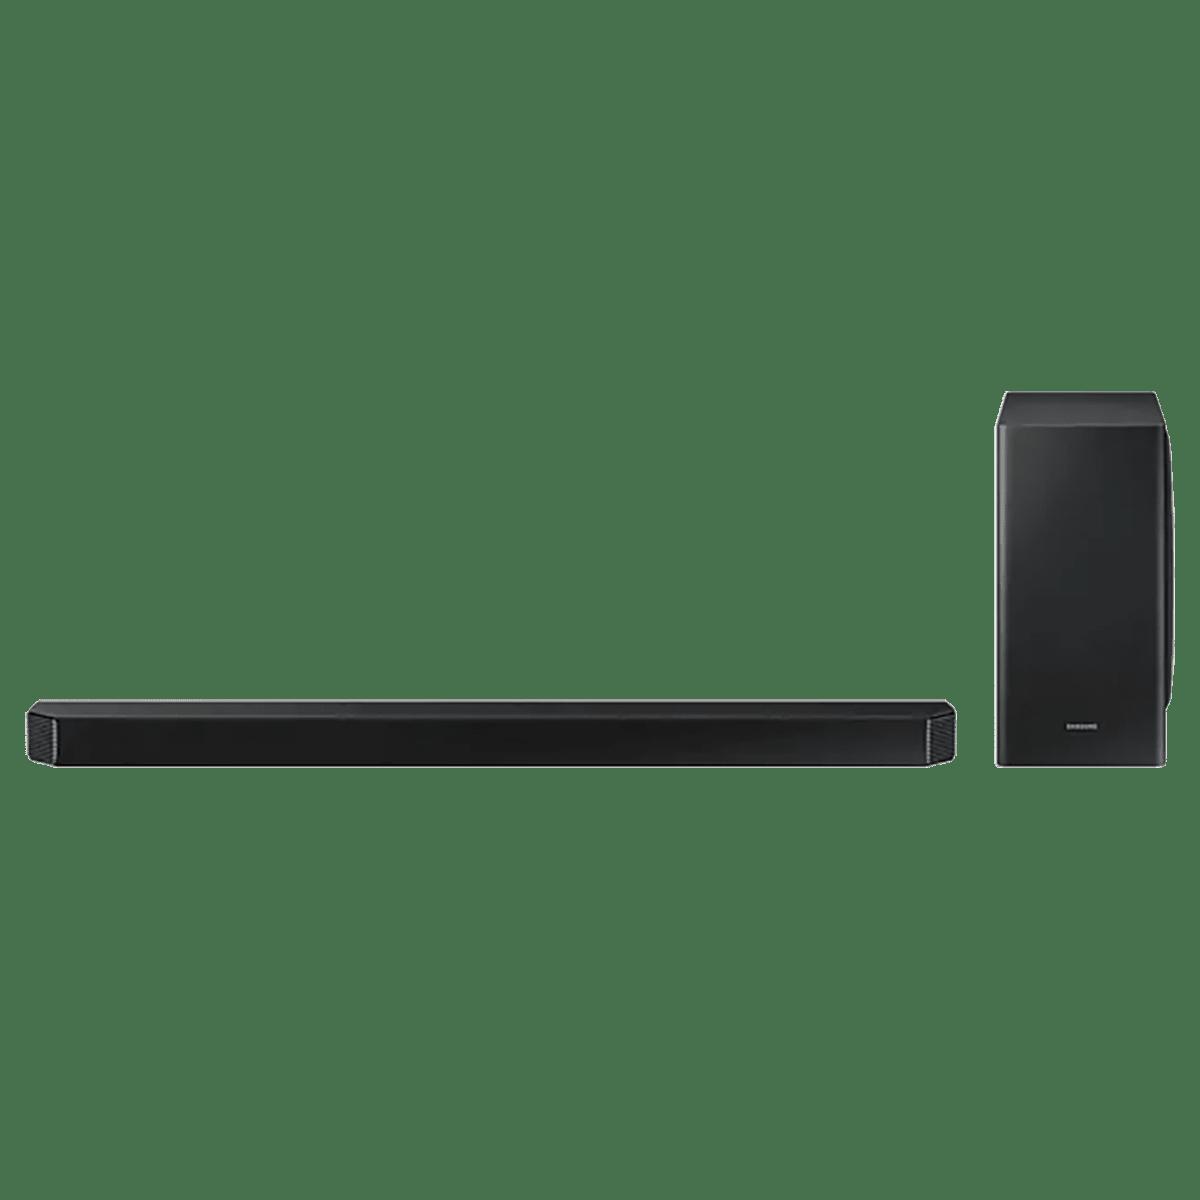 Samsung 7.1.2 Channel 406 Watts Q-Symphony SoundBar with Subwoofer (Built -in Voice Assistant, HW-Q900T/XL, Black)